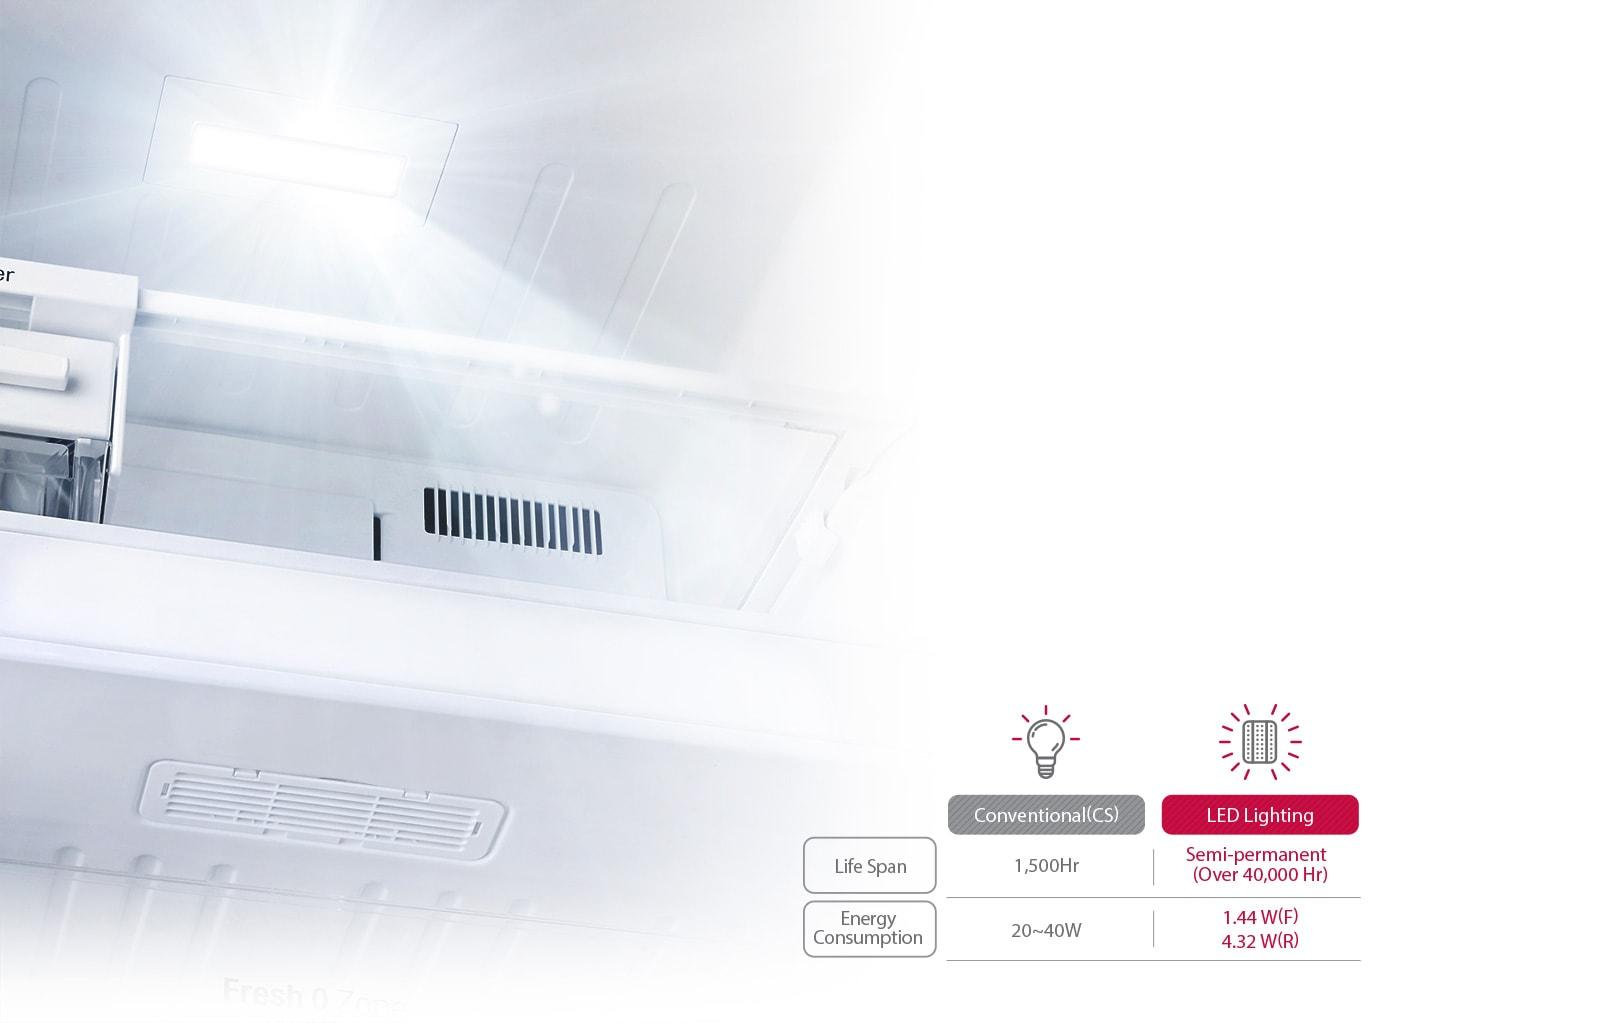 LG GL-T432FPZ3 437 Ltr LED Lighting